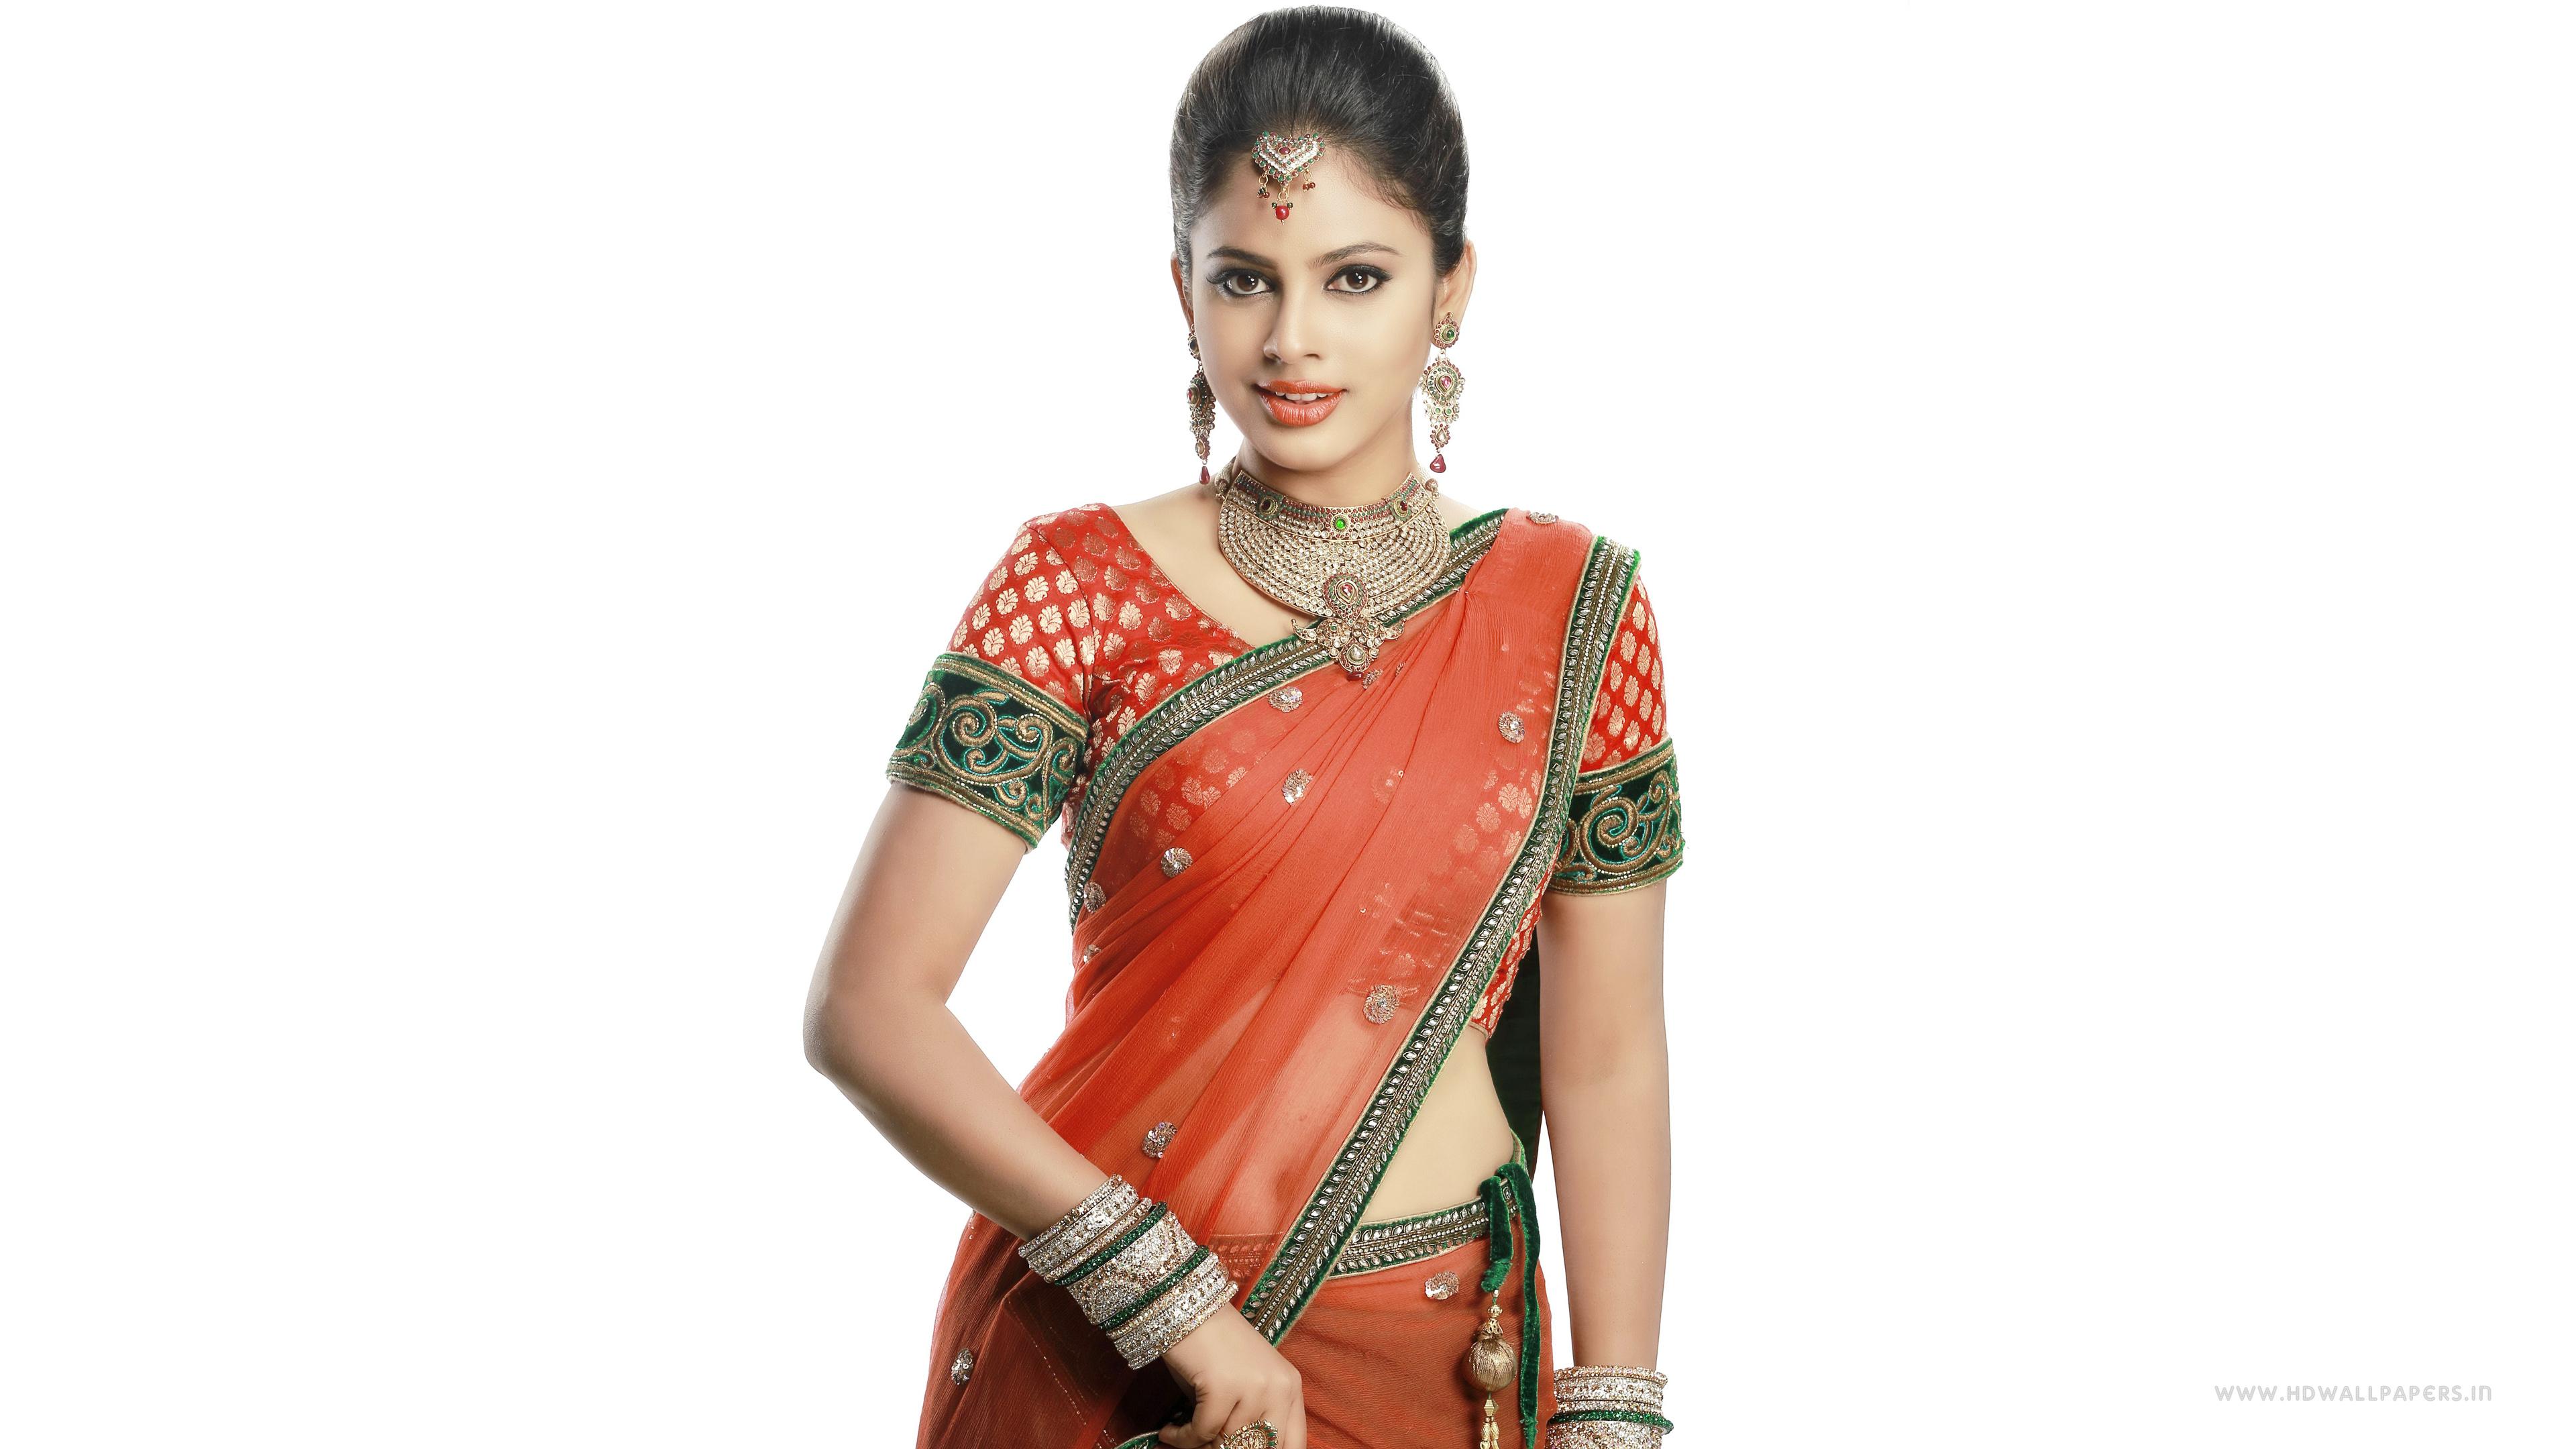 Saree Actress Nandita Swetha Wallpaper Rashi Khanna Traditional Dress Images